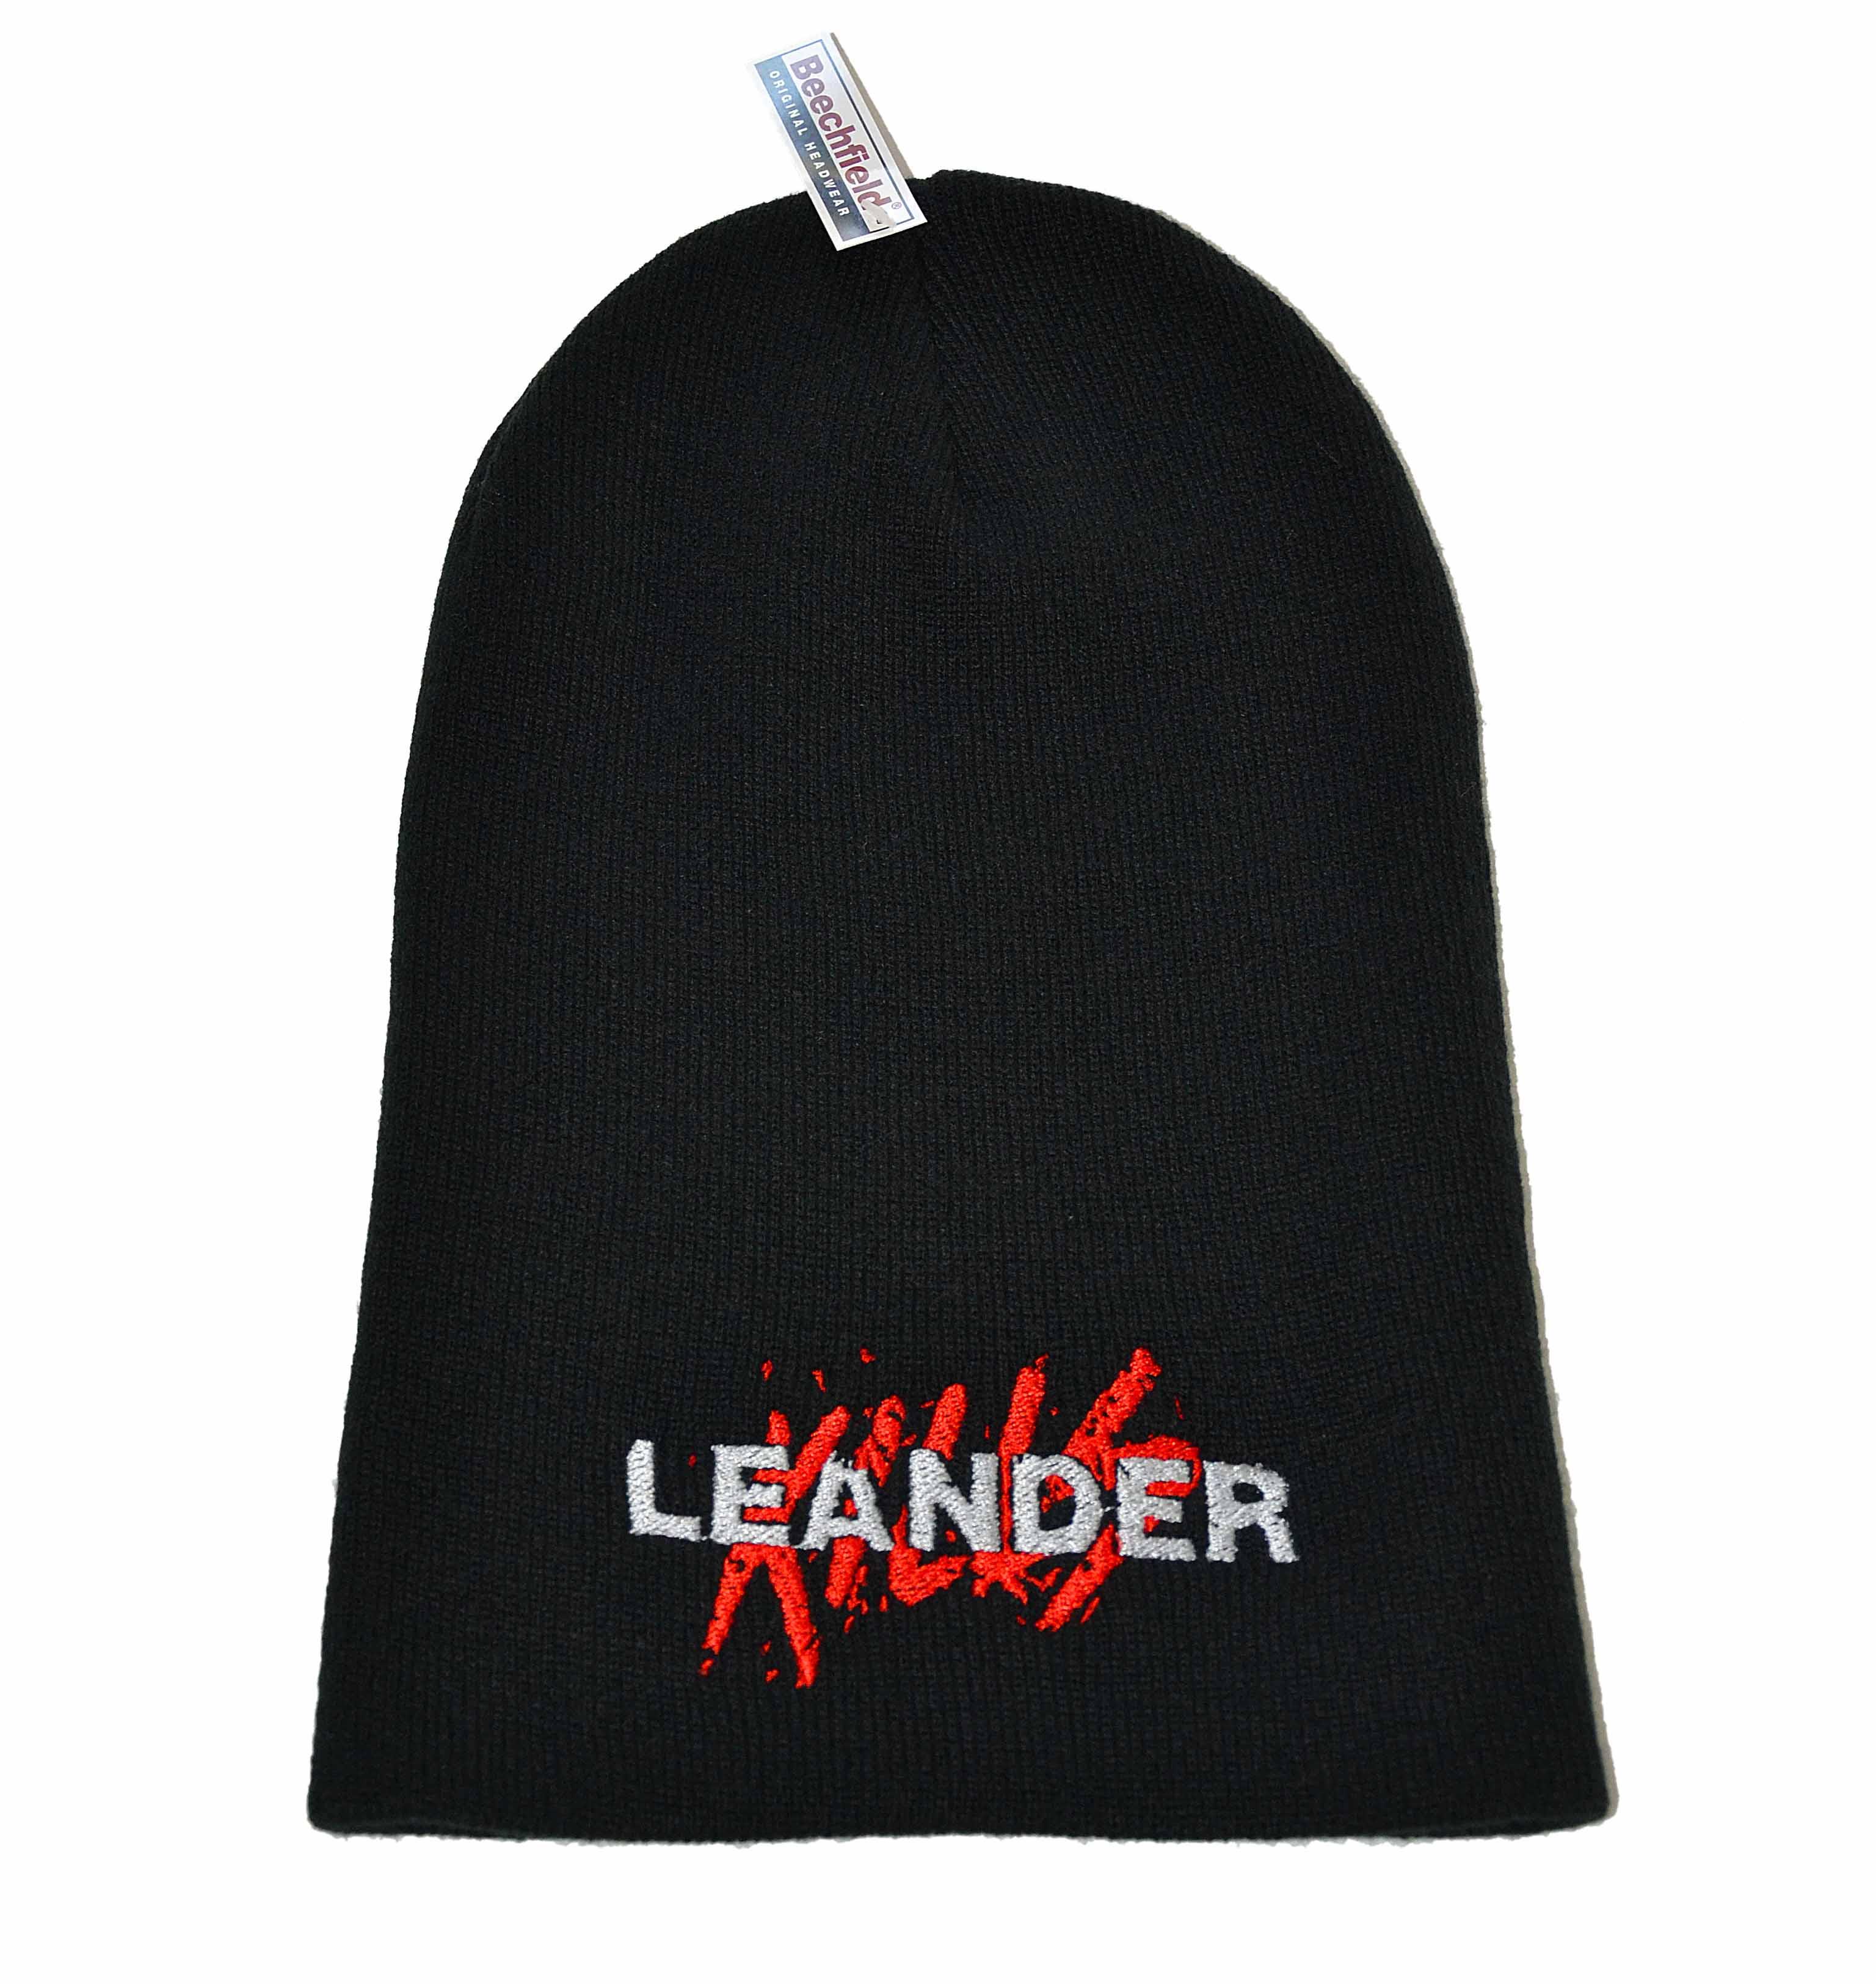 Leander Kills - téli sapka (piros logó) ⋆ Leander Kills Webshop b8d8726e46